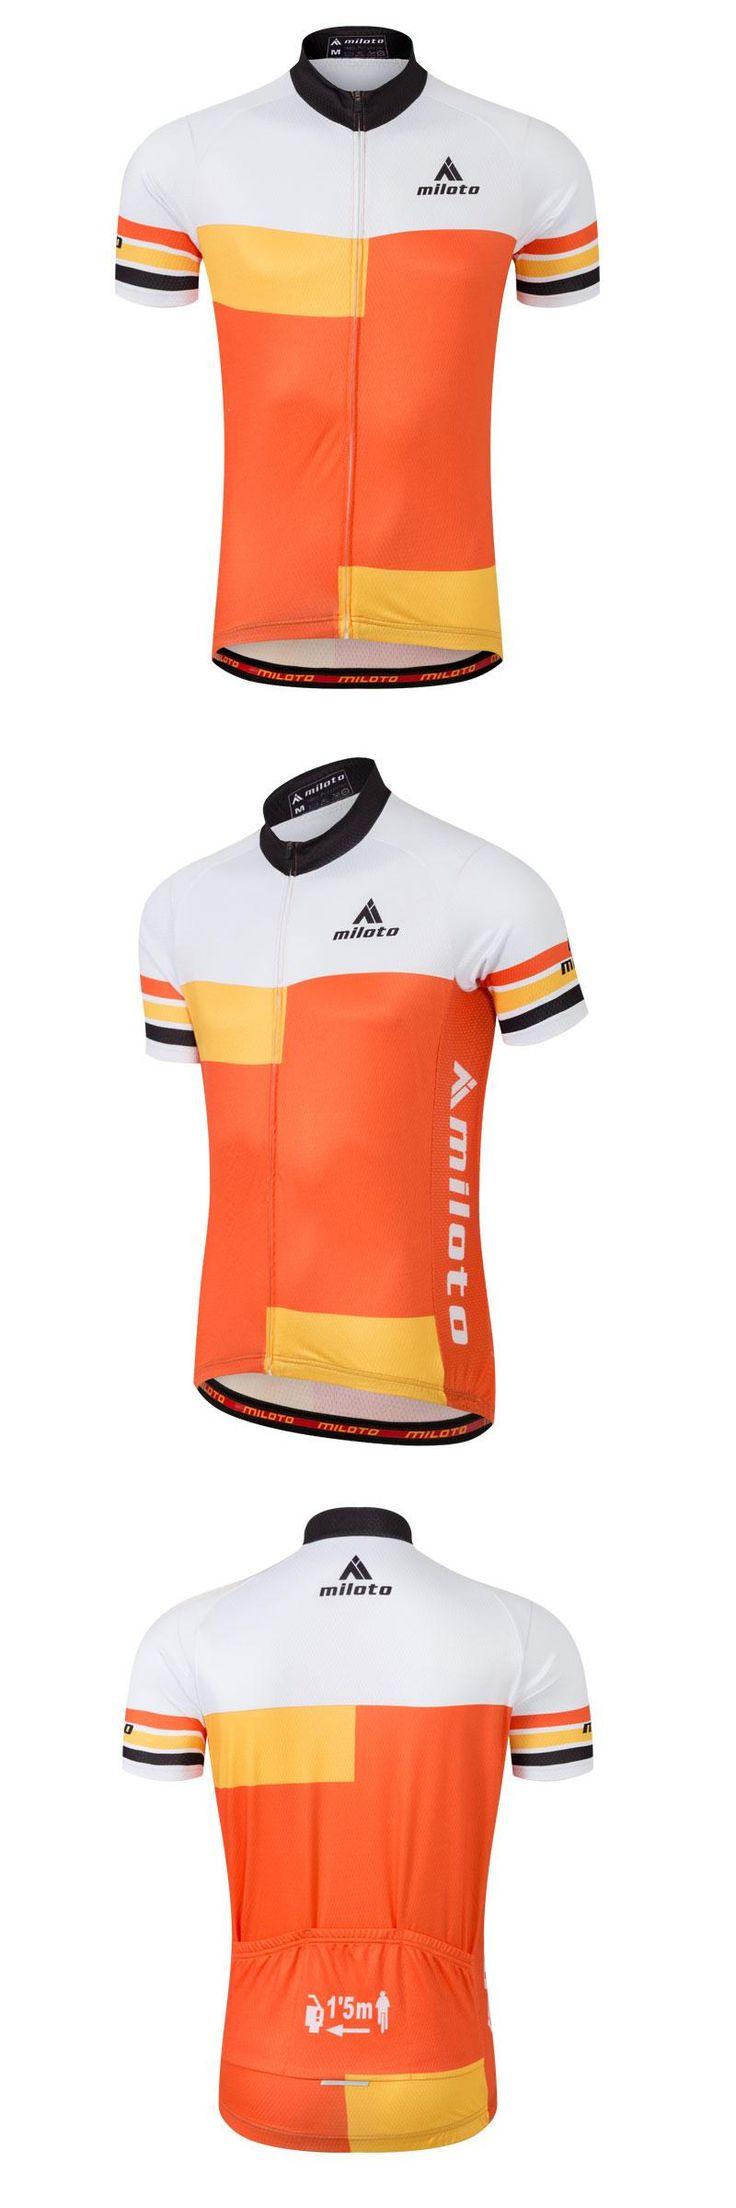 [Visit to Buy] Plus Size 4XL 5XL Cycling Jerseys Short Sleeve Men Bike Bicycle Shirts / T-shirts Cycle Jacket Reflective Orange Antislip #Advertisement